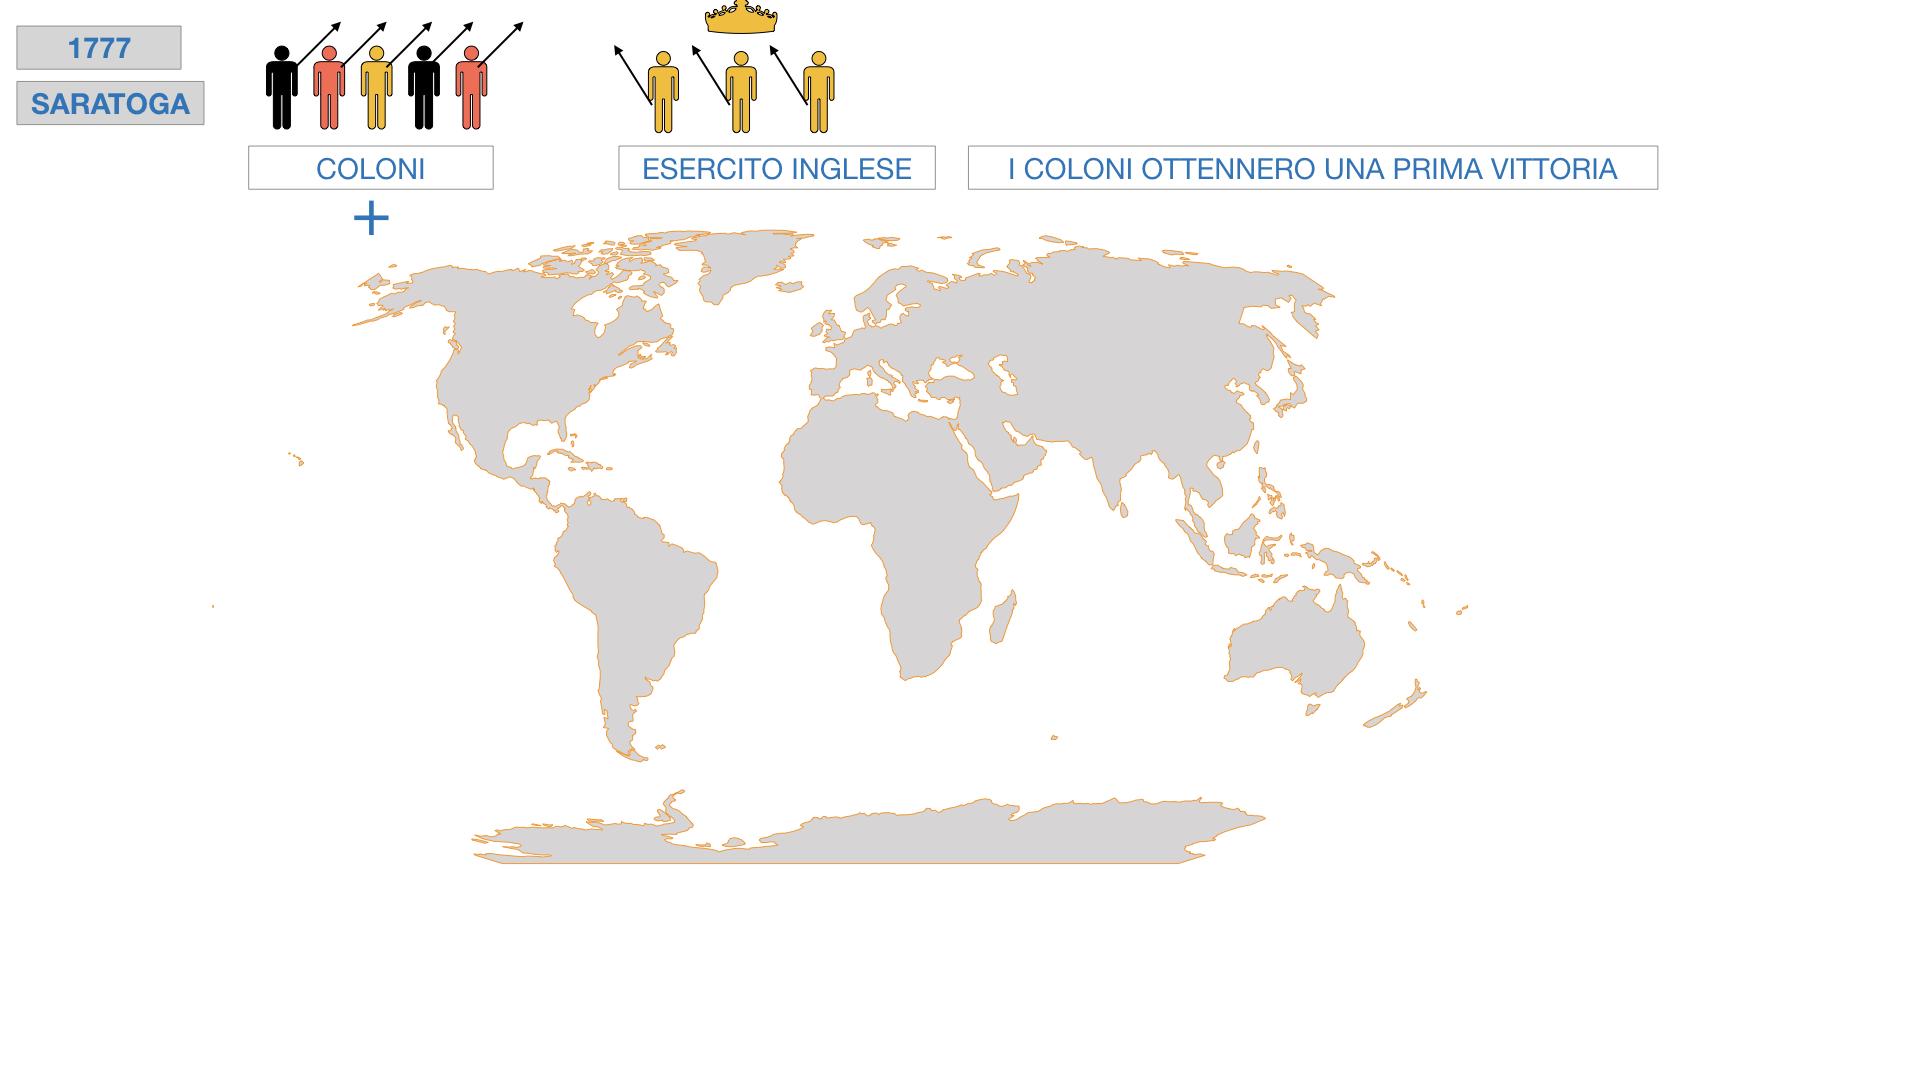 GUERRA DI INDIPENDENZA AMERICANA_SIMULAZIONE.122